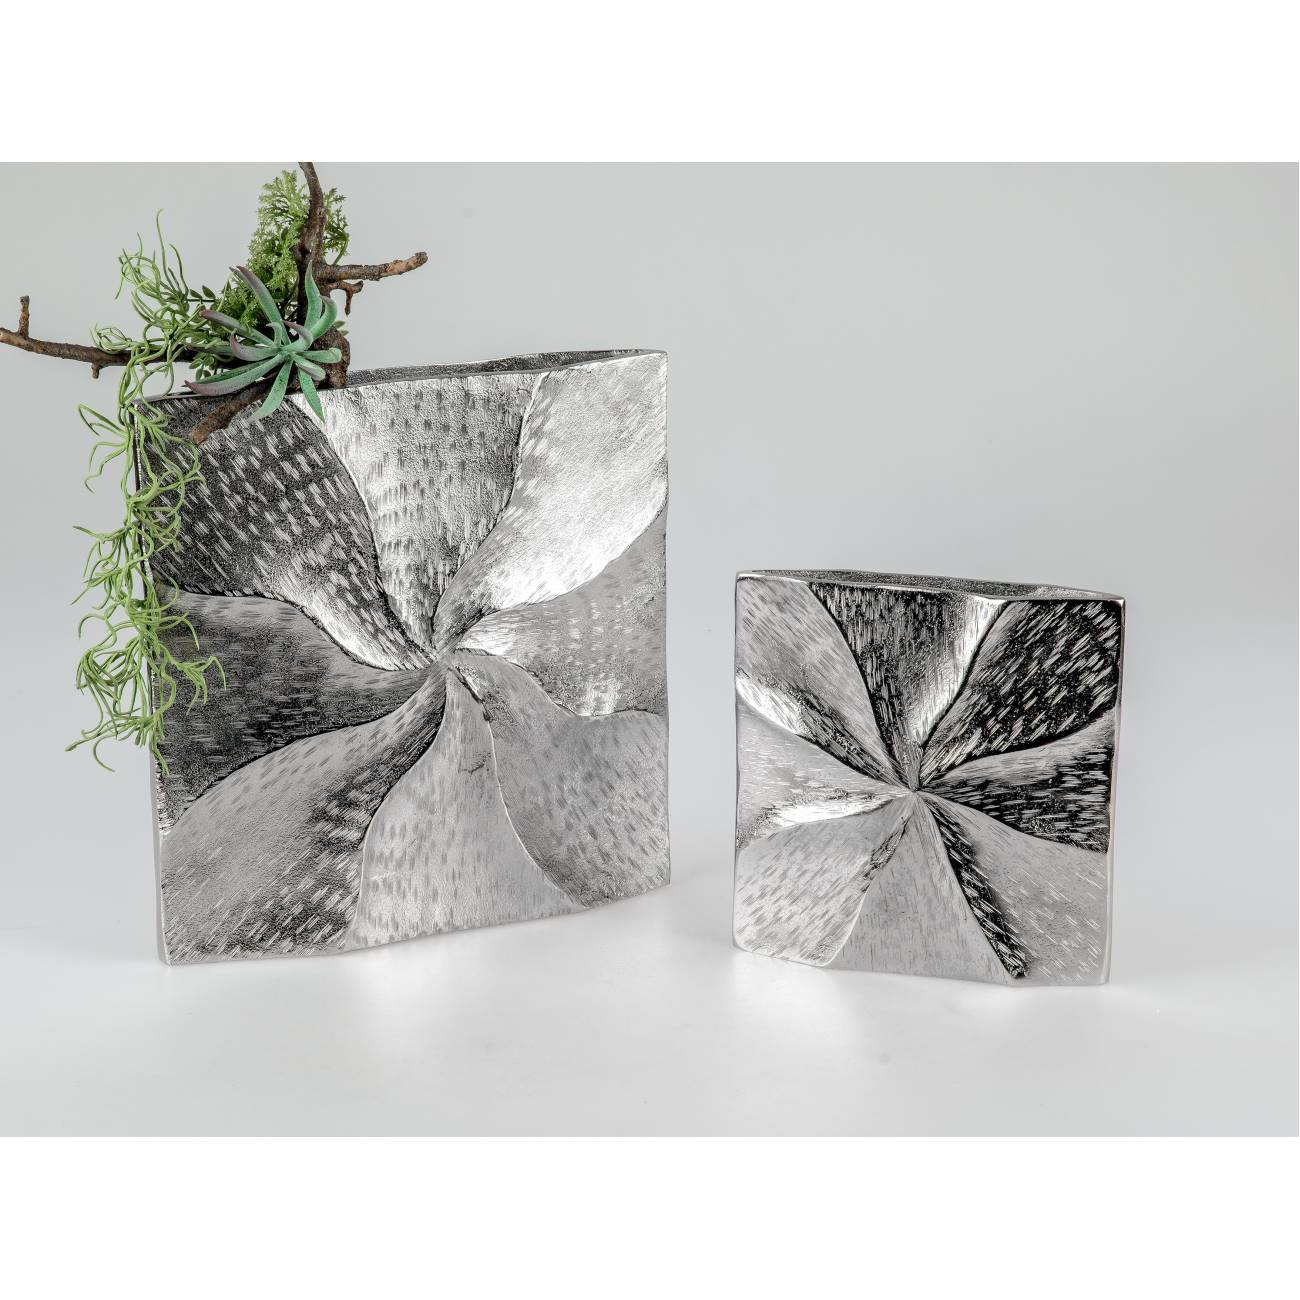 31cm silber Metall Formano Aluminium Vase ALU SPIRALE eckig H